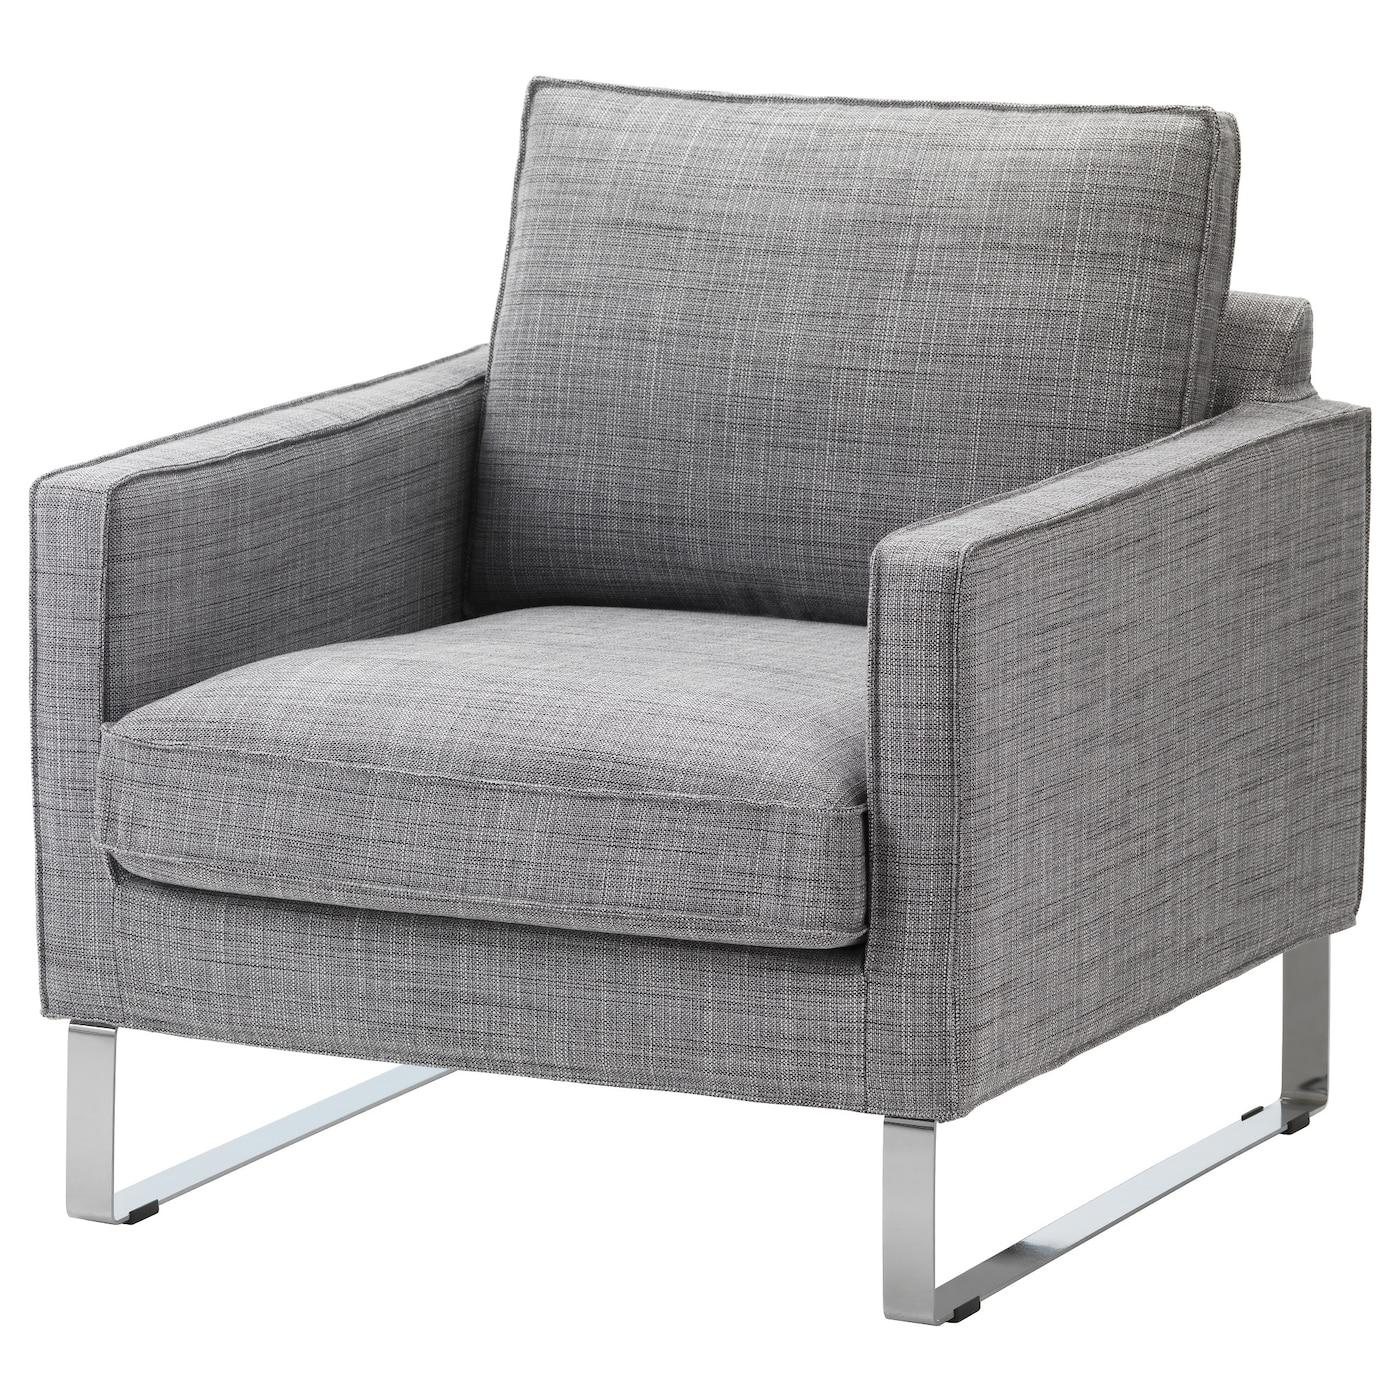 mellby armchair isunda grey  ikea - ikea mellby armchair  year guarantee read about the terms in theguarantee brochure